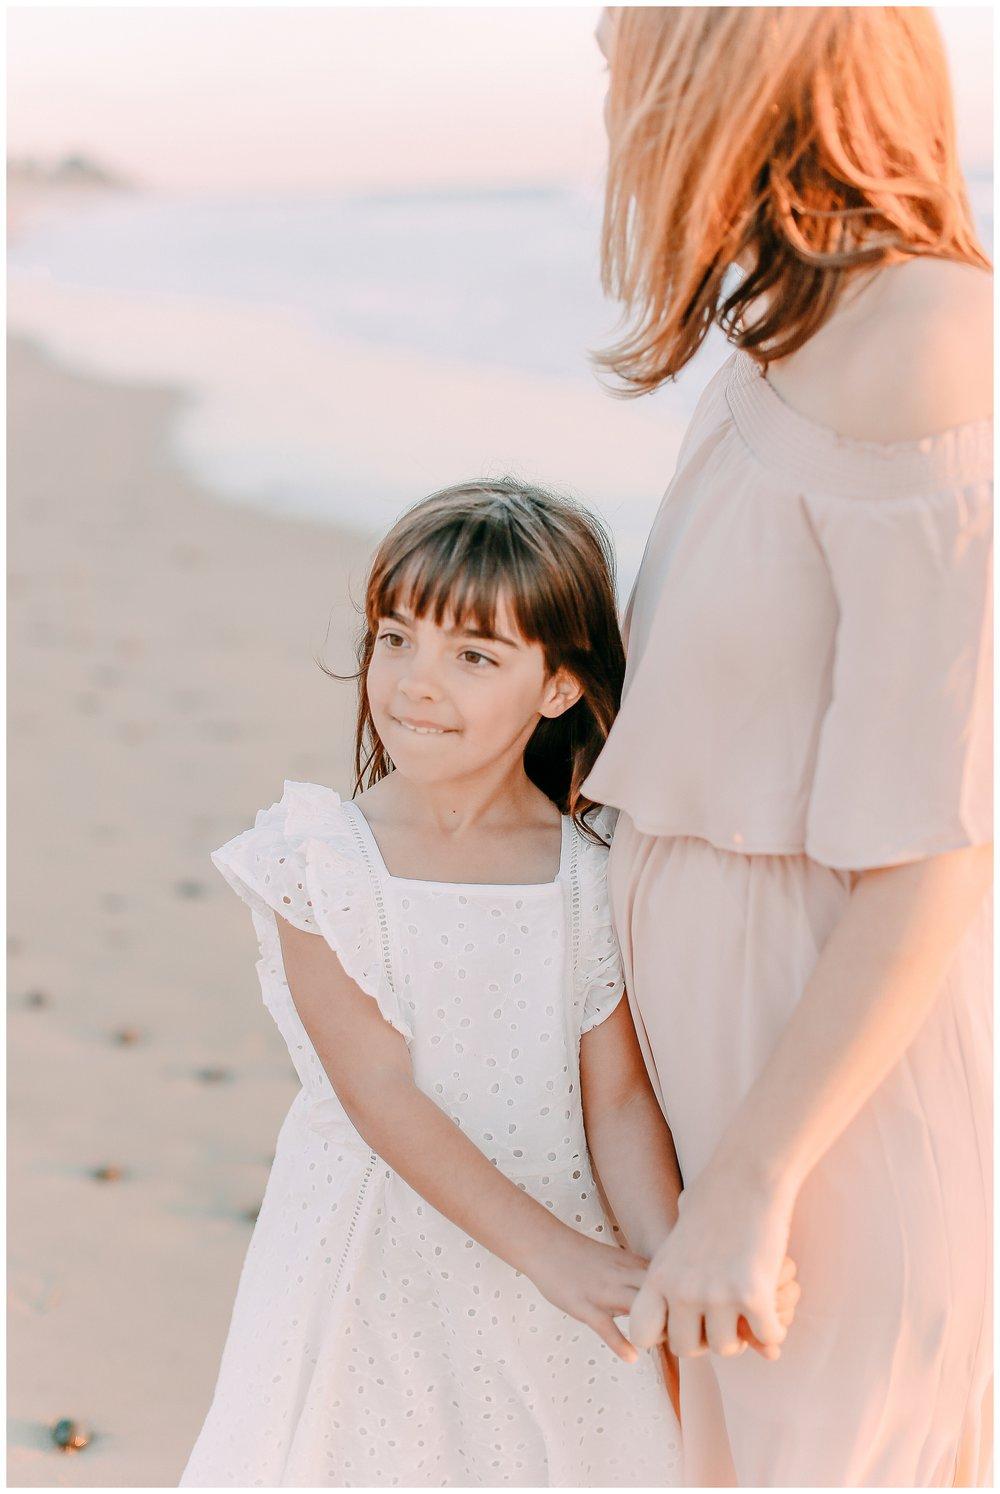 San_clemente_family_session_Orange_county_family_photographer_cori_kleckner_photography_laguna_beach_family_session_0687.jpg